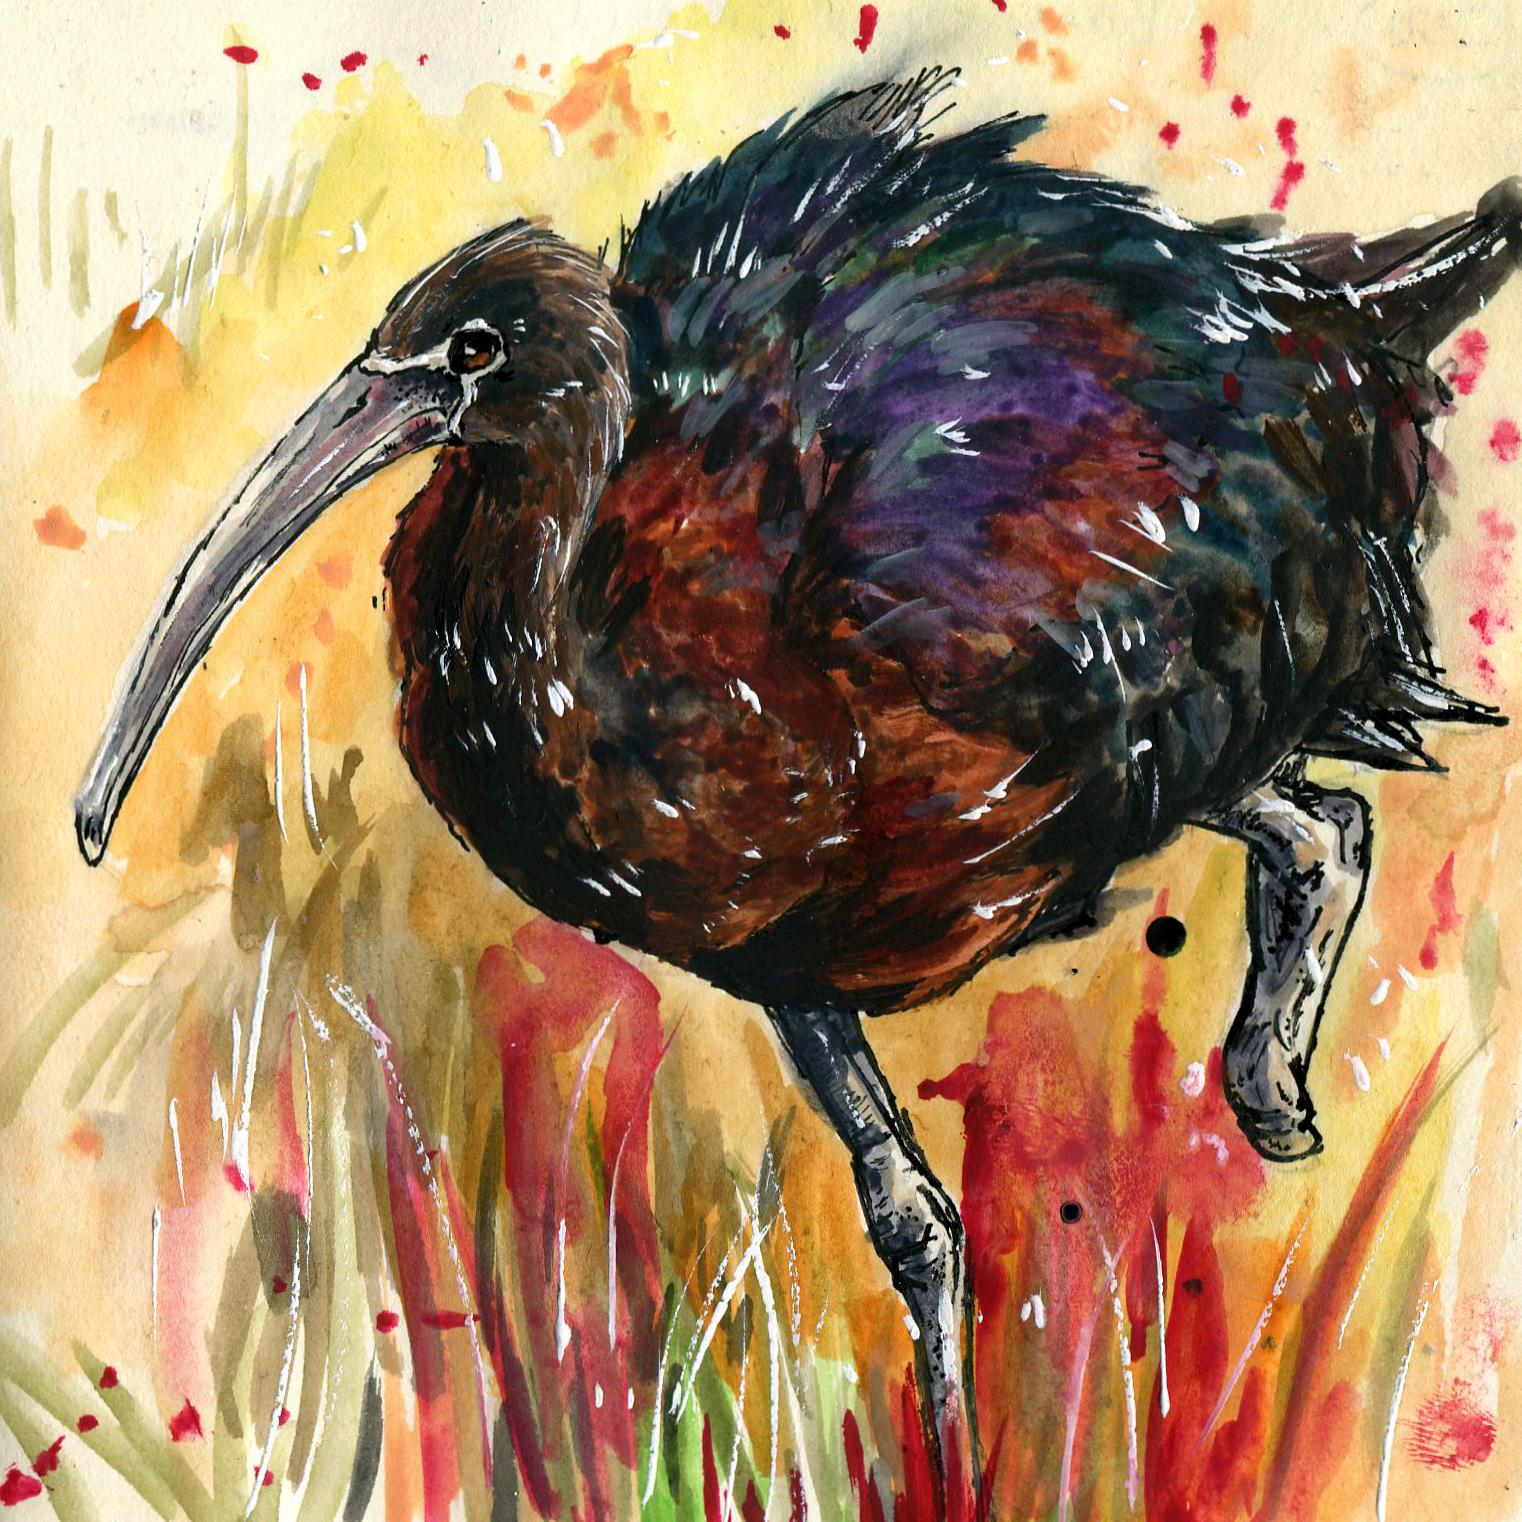 249. Glossy Ibis